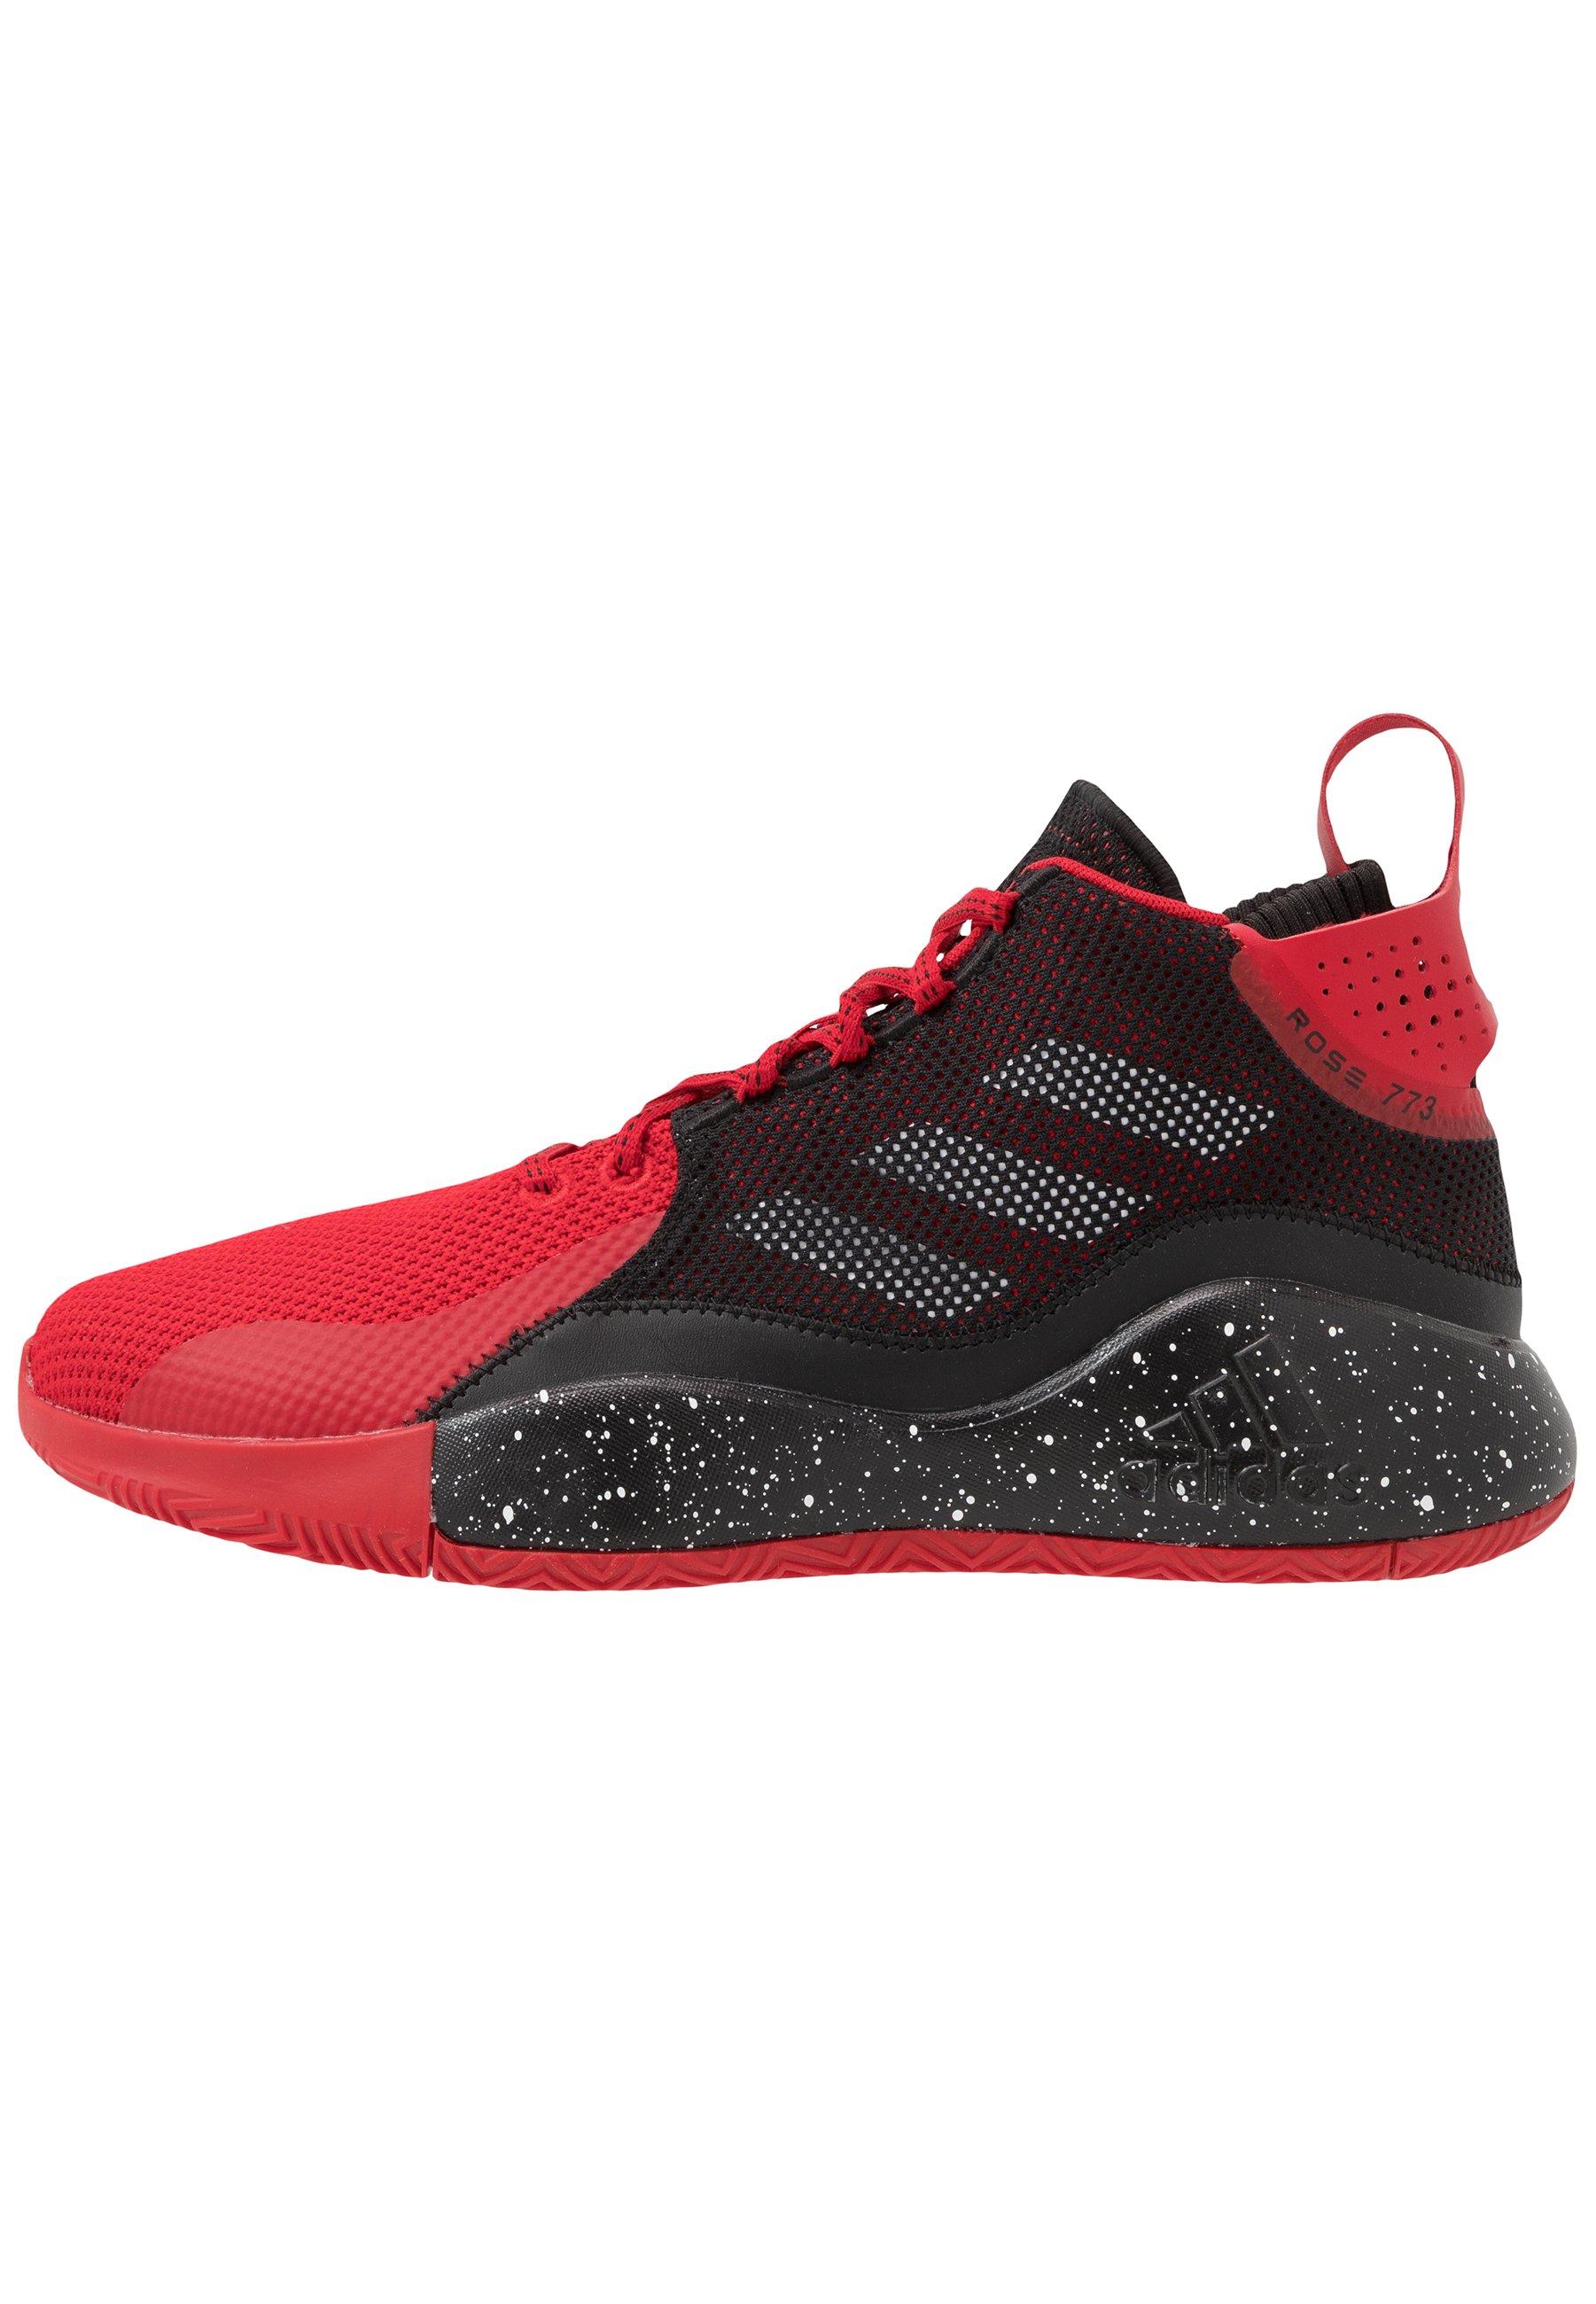 adidas Performance ROSE 773 2020 Chaussures de basket